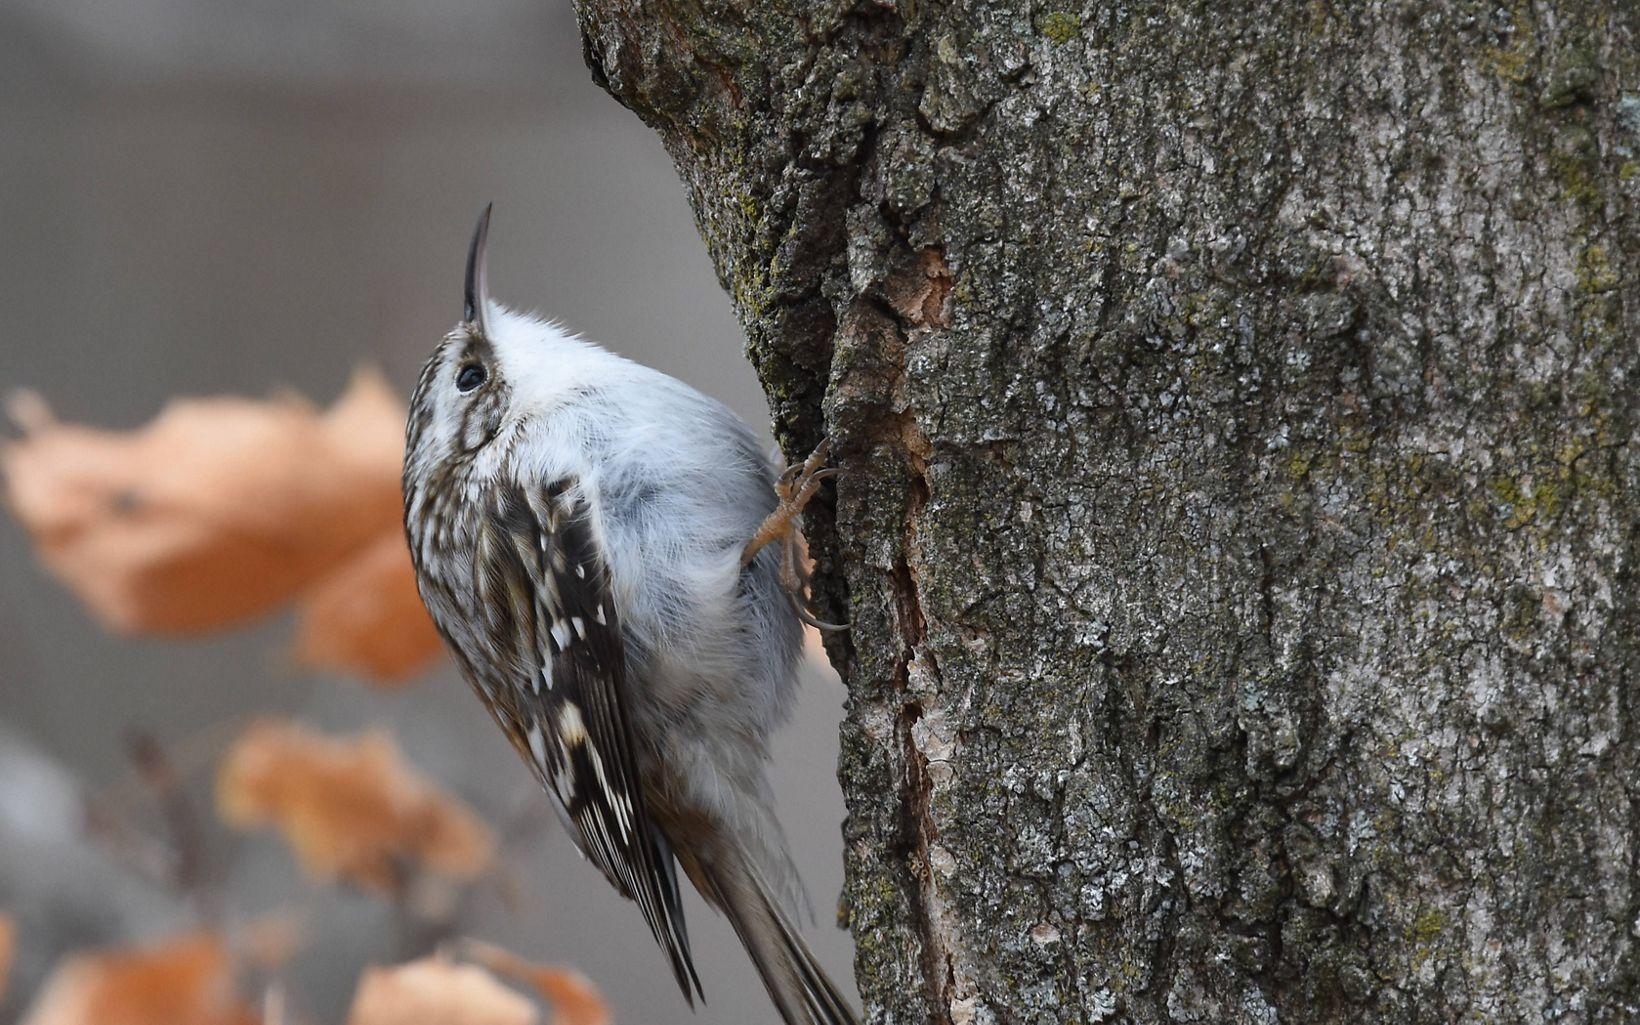 A plump bird seeks food in a tree trunk.